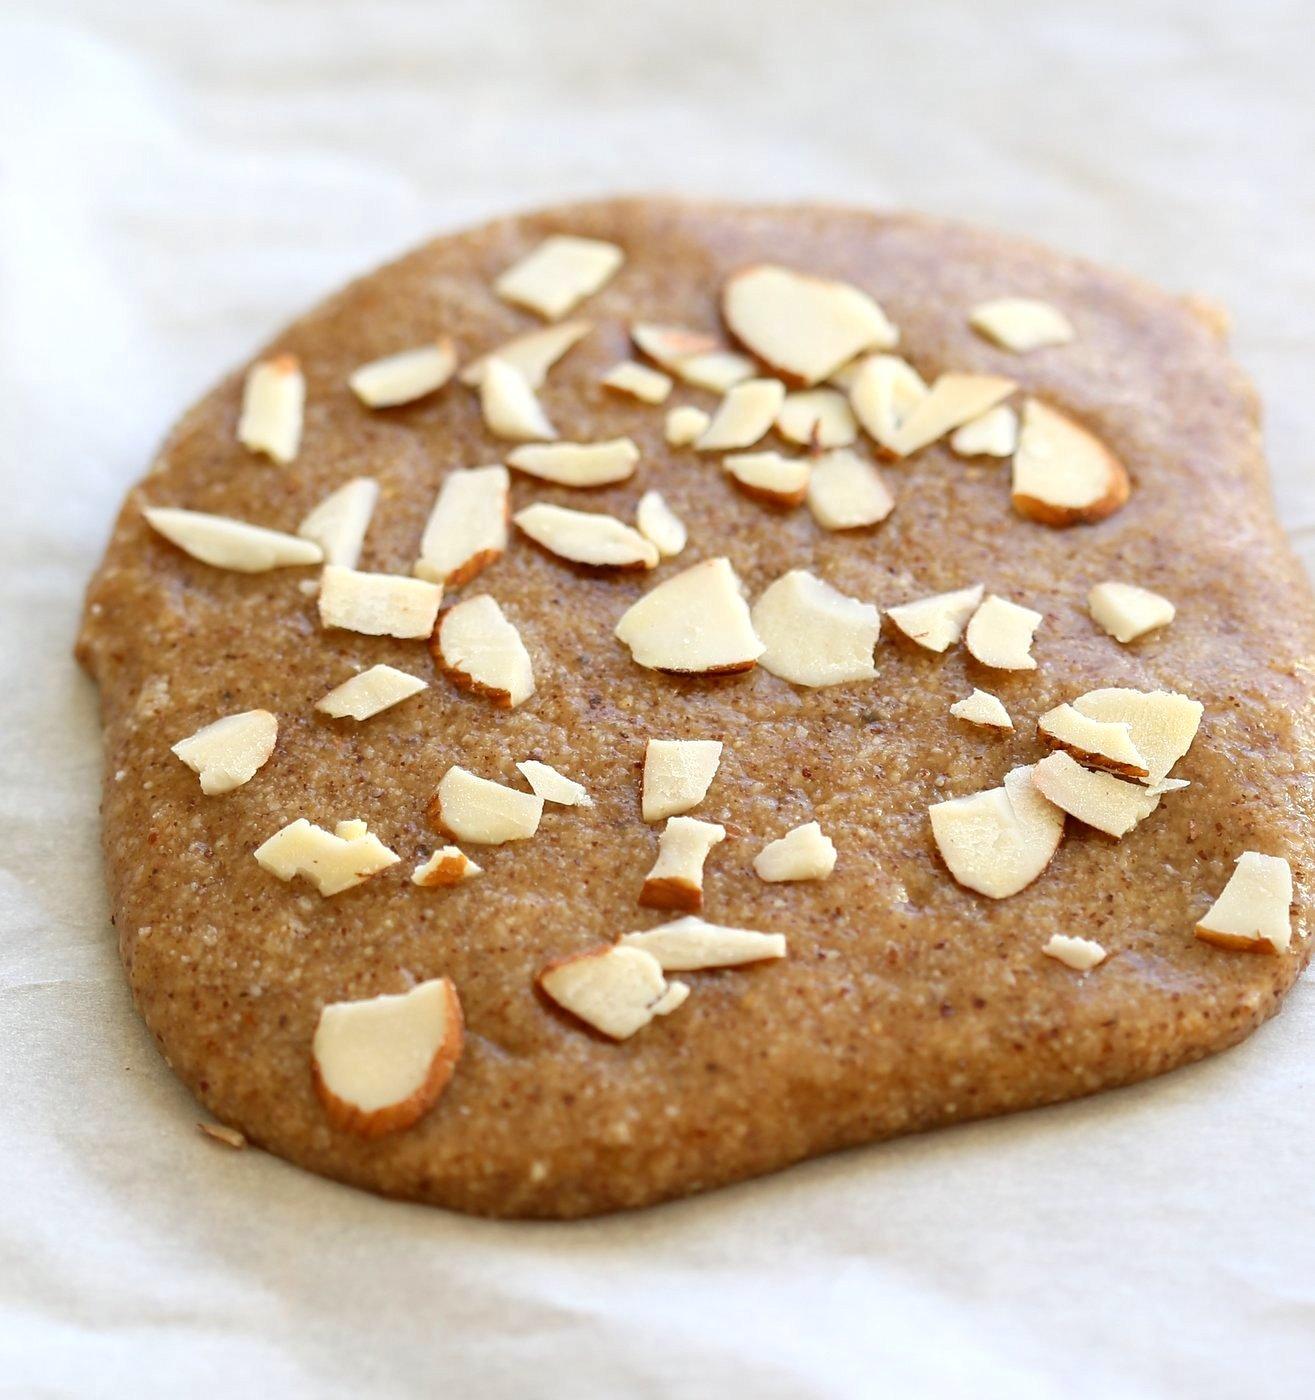 15 min Almond fudge with Cardamom and Basundi - thickened milk with saffron and nuts. Basundi or Rabri with almond milk. Indian Vegan Sweets for Diwali. | VeganRicha..com